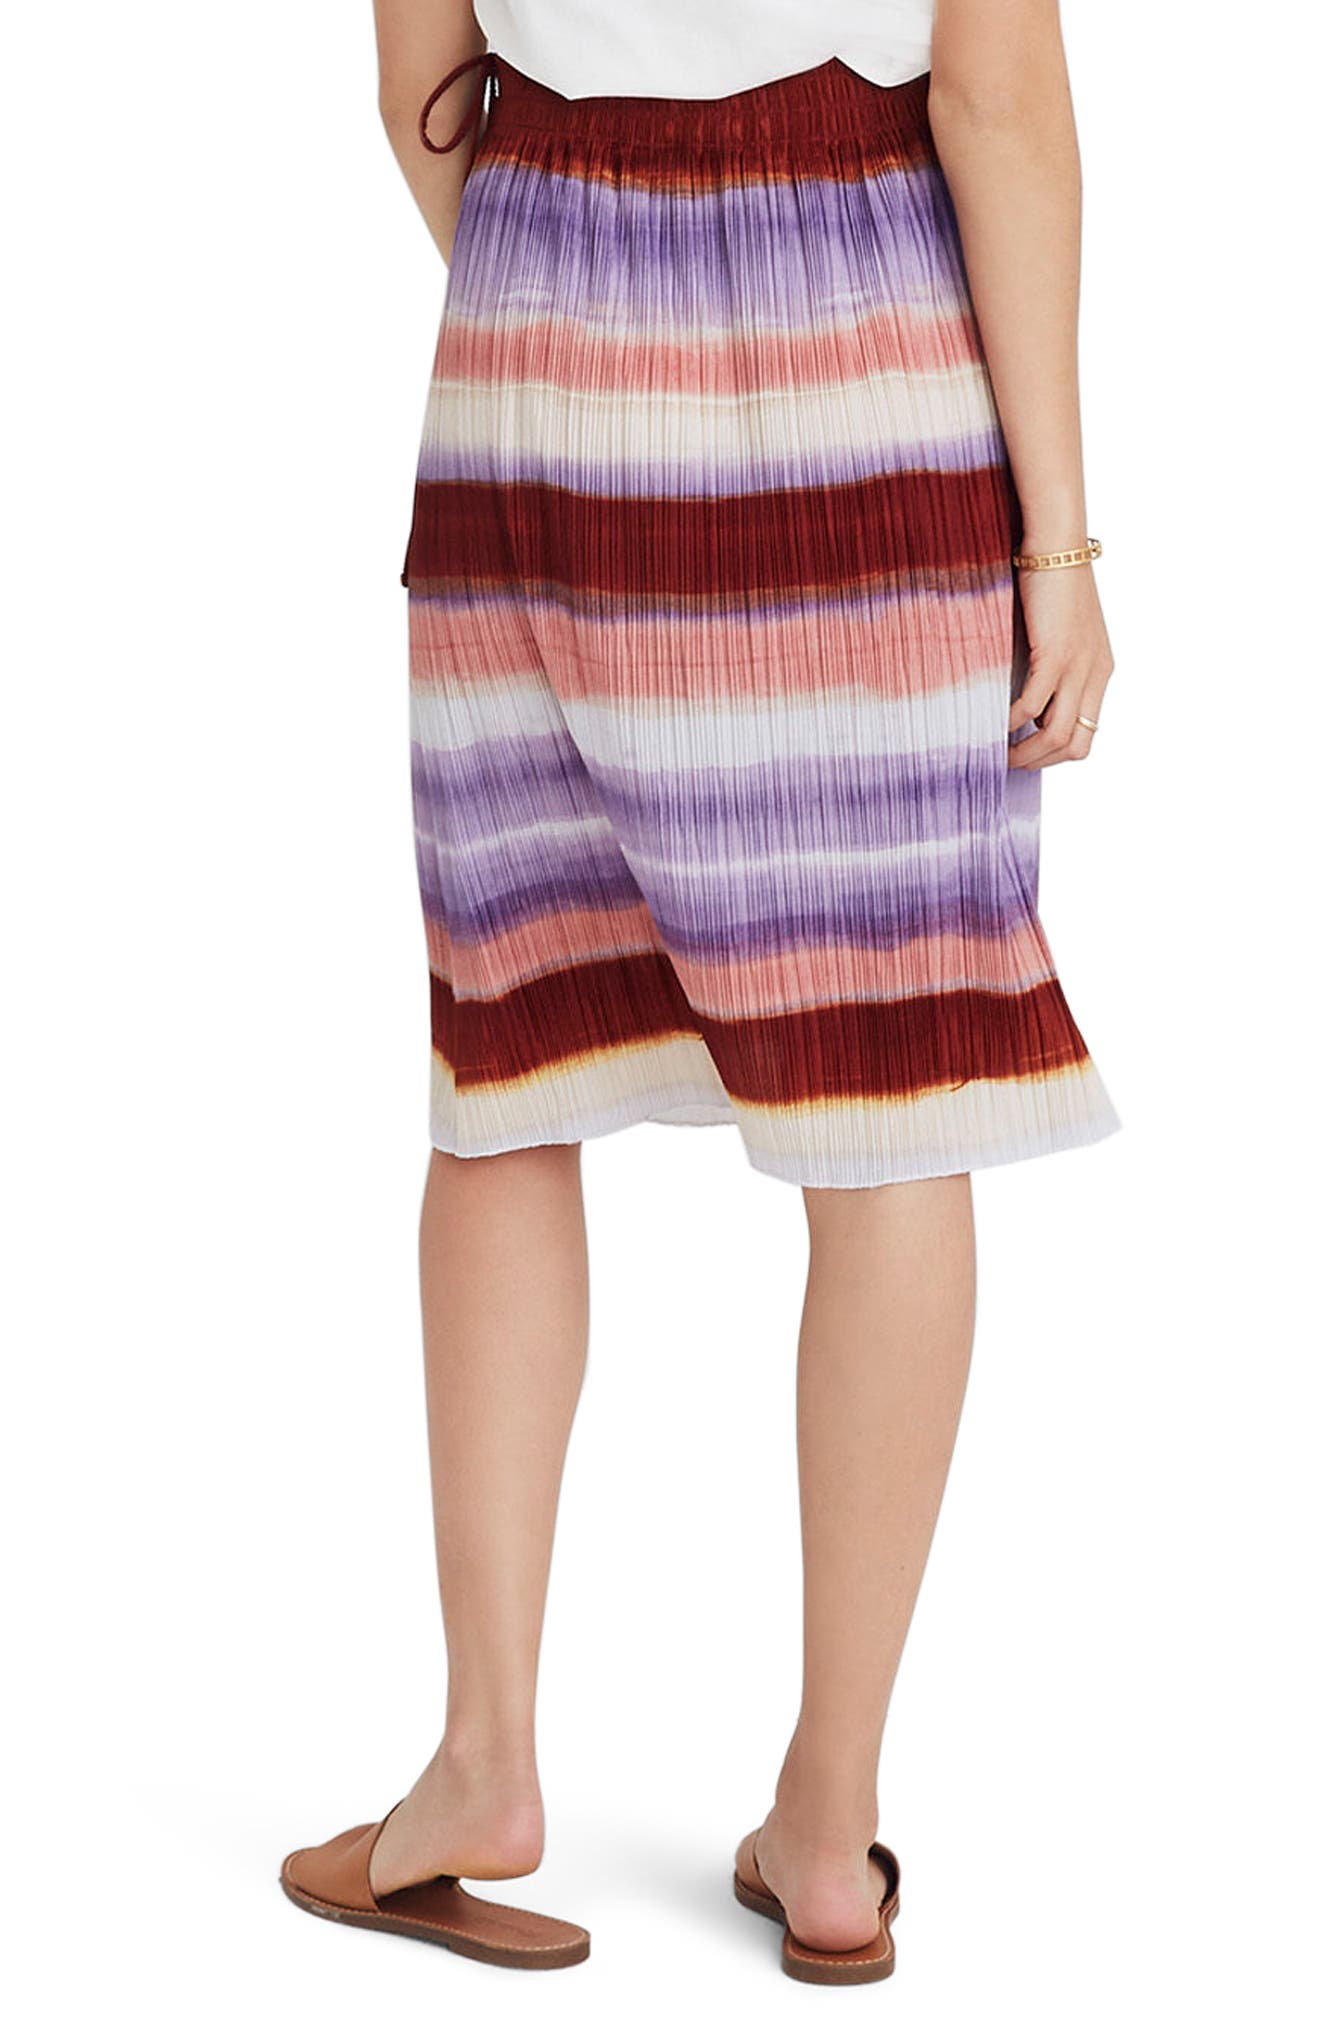 Texture & Thread Ombré Rainbow Micropleat Midi Skirt,                             Alternate thumbnail 2, color,                             Clementine Cream